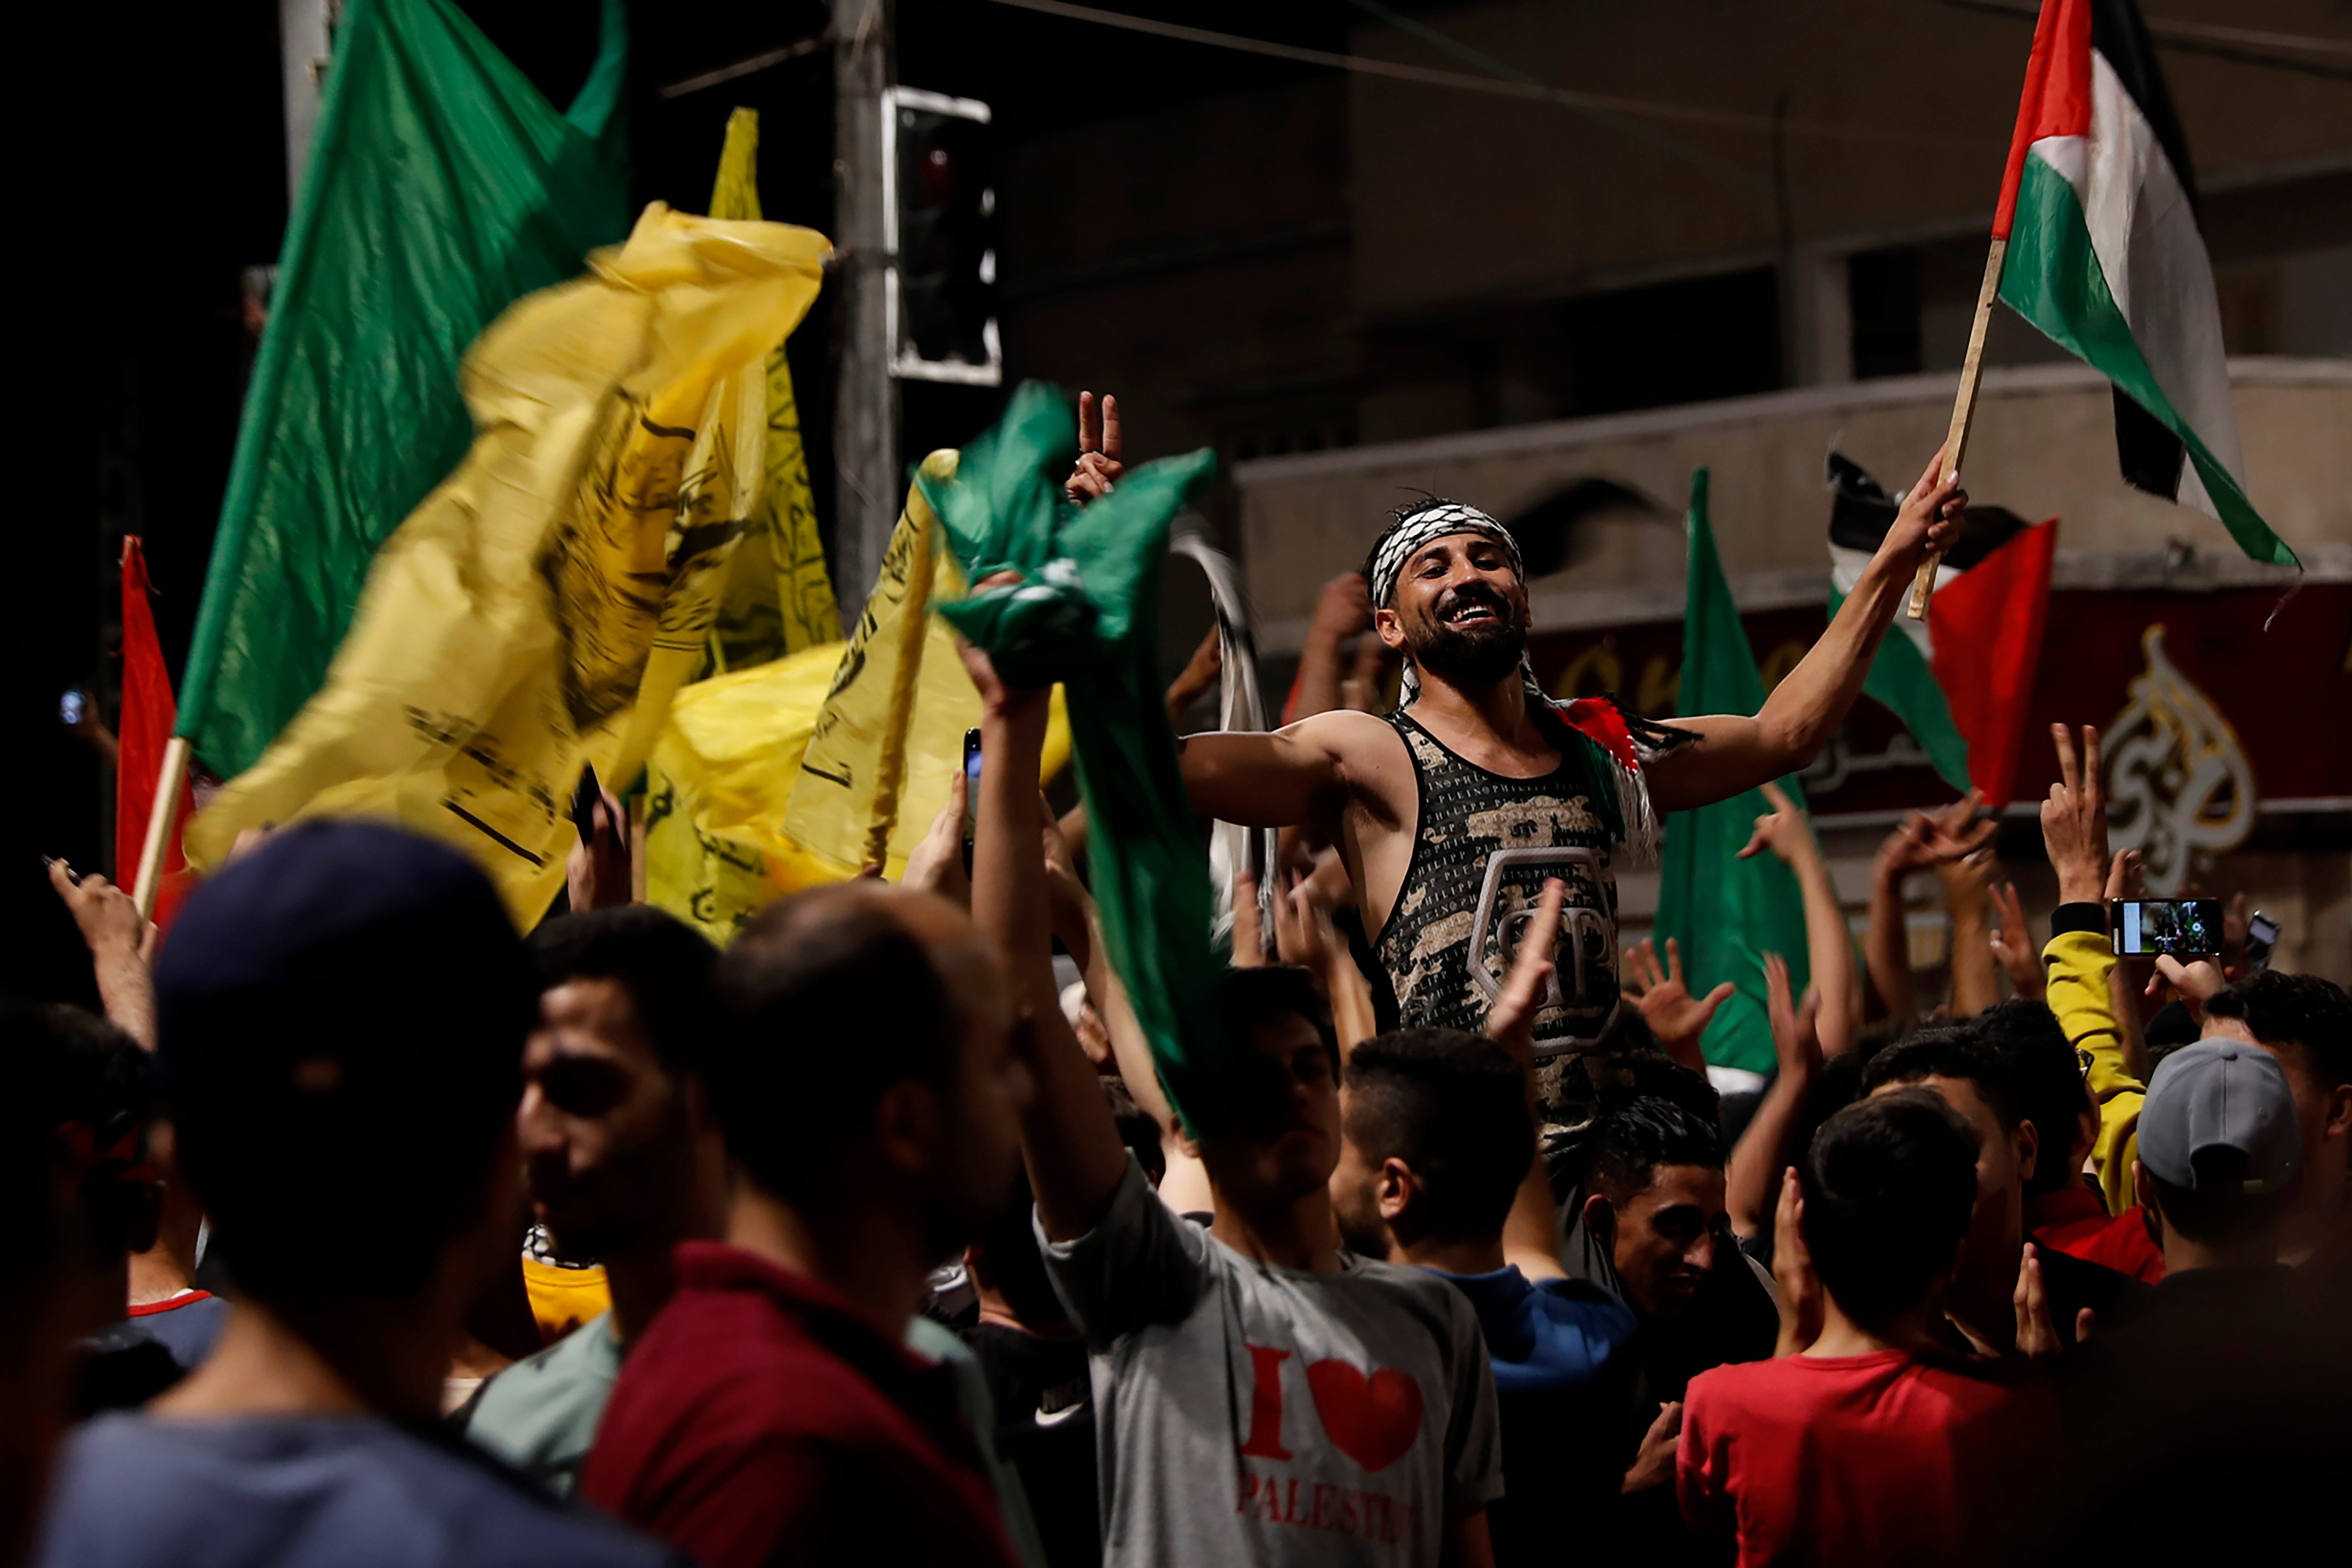 Palestinians see victory in Gaza truce as Israel warns Hamas 2